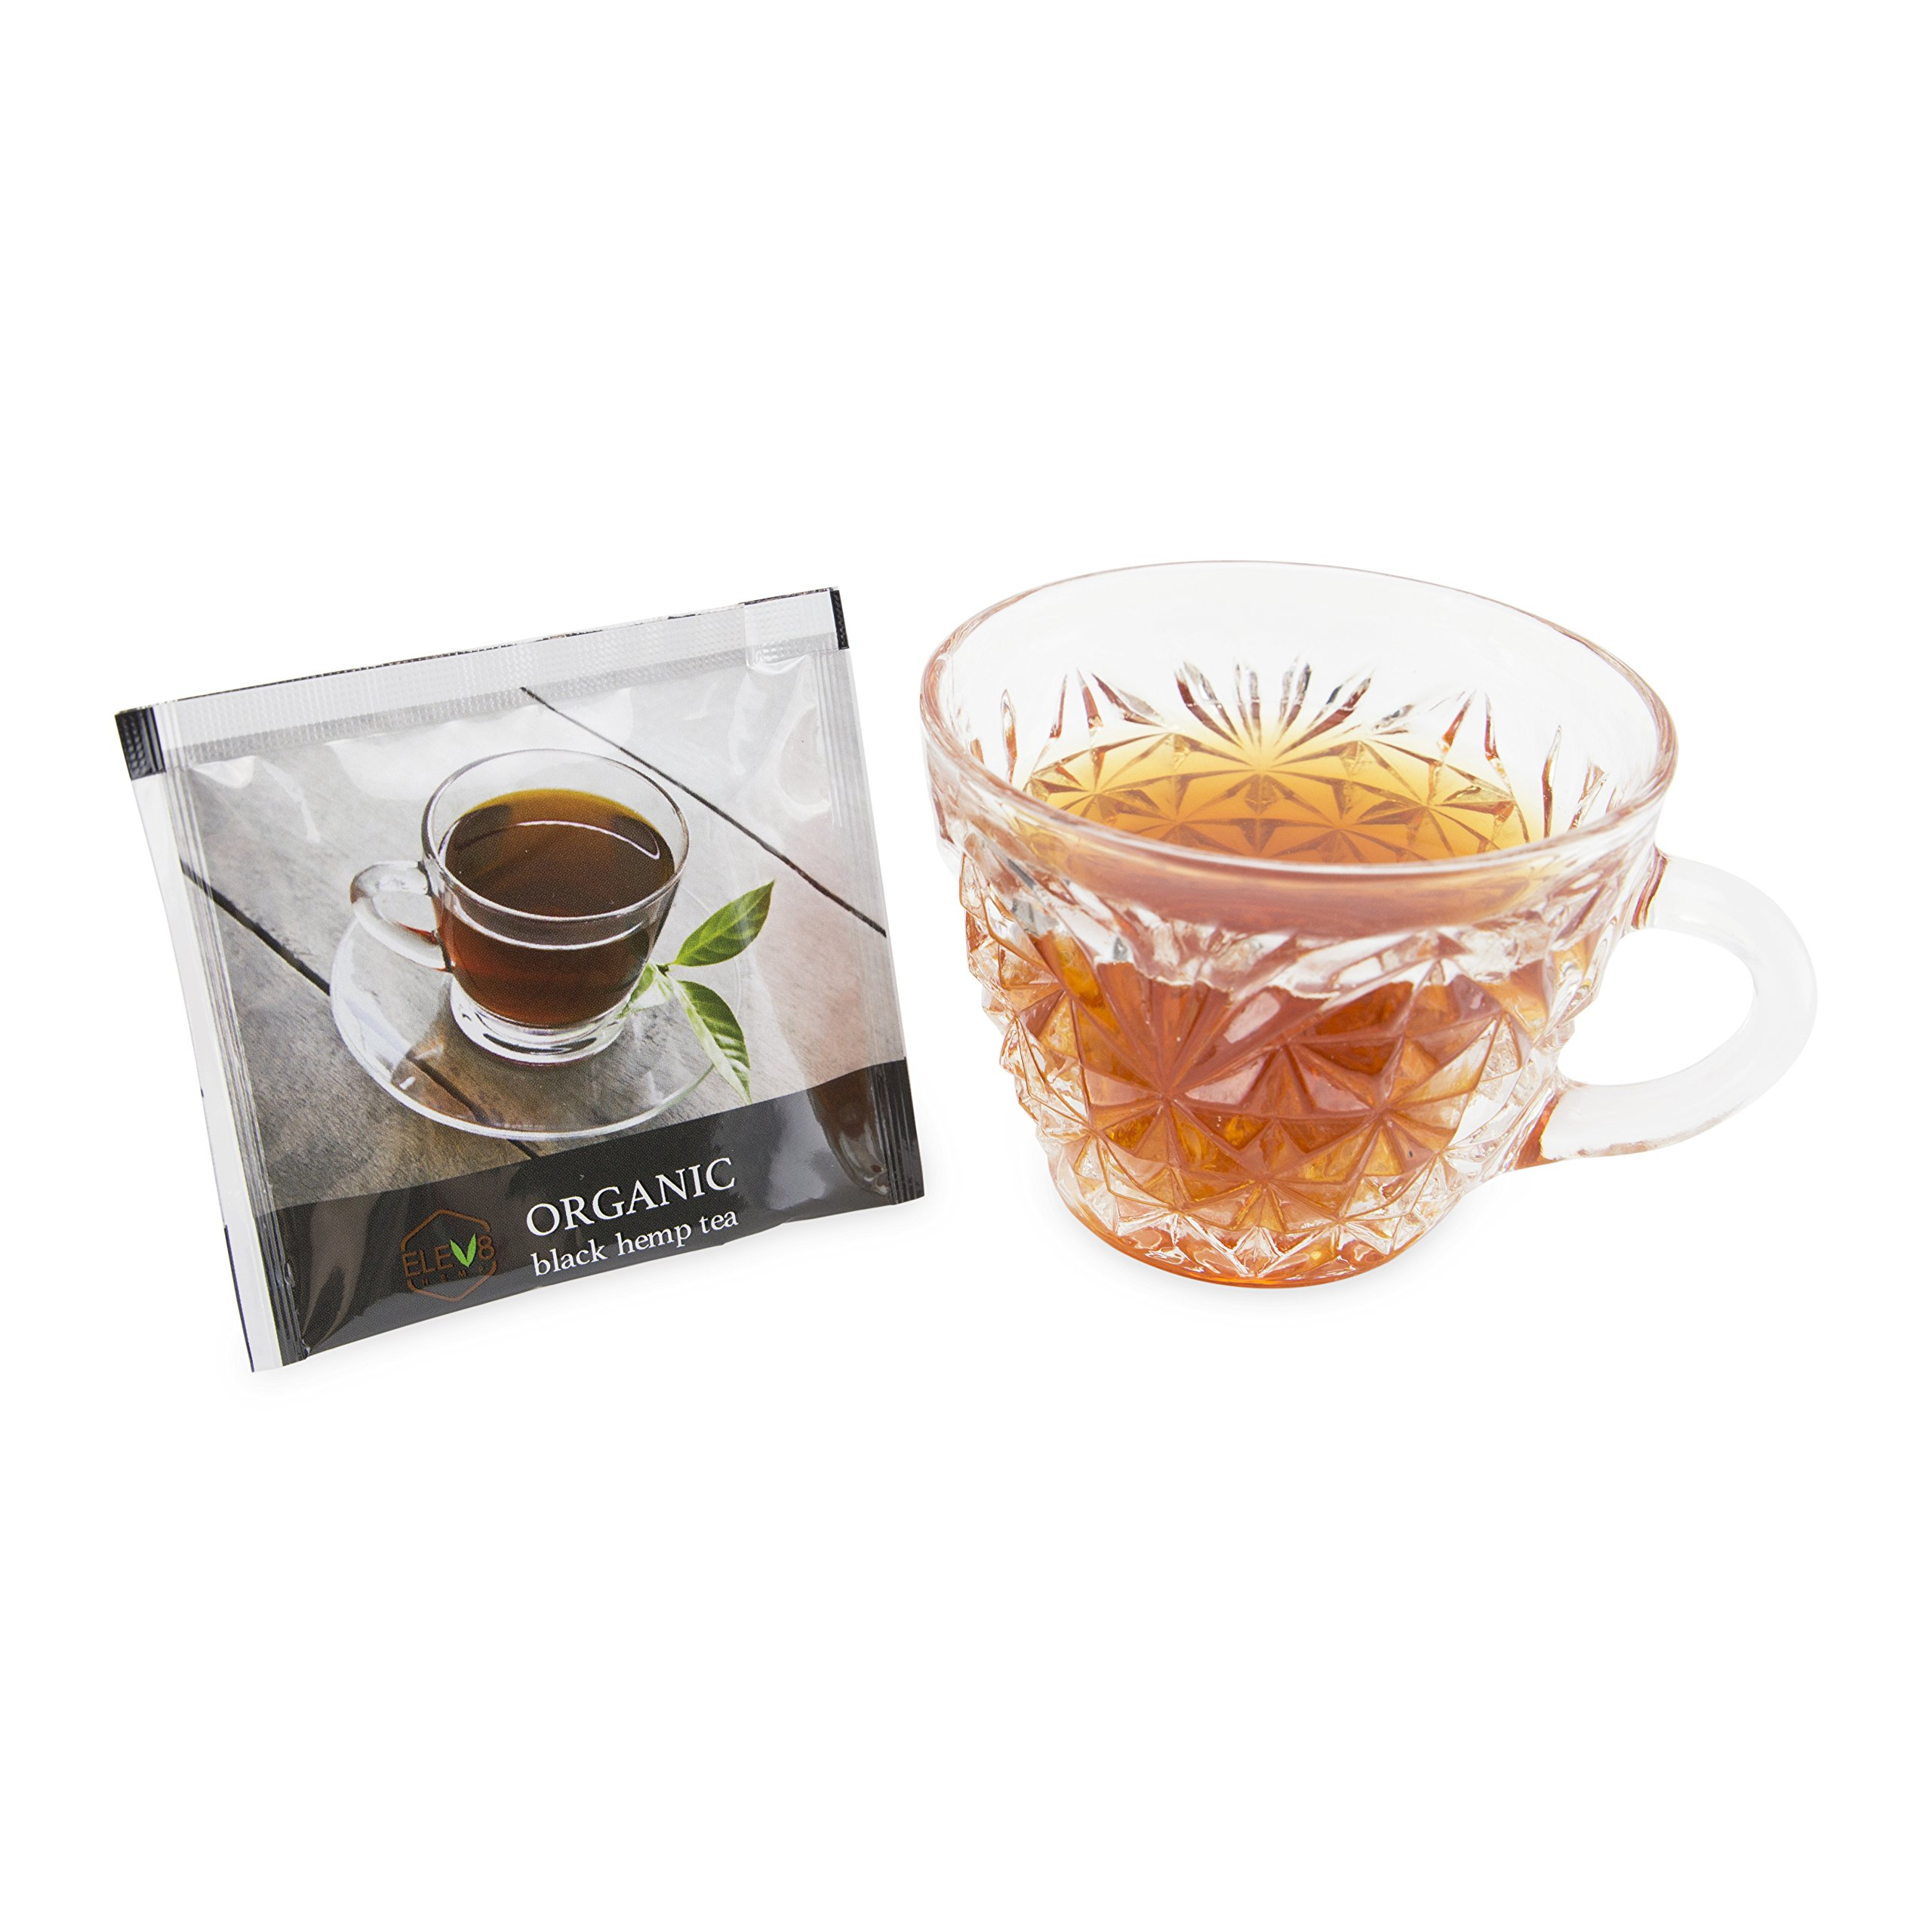 Elev8 Hemp Tea